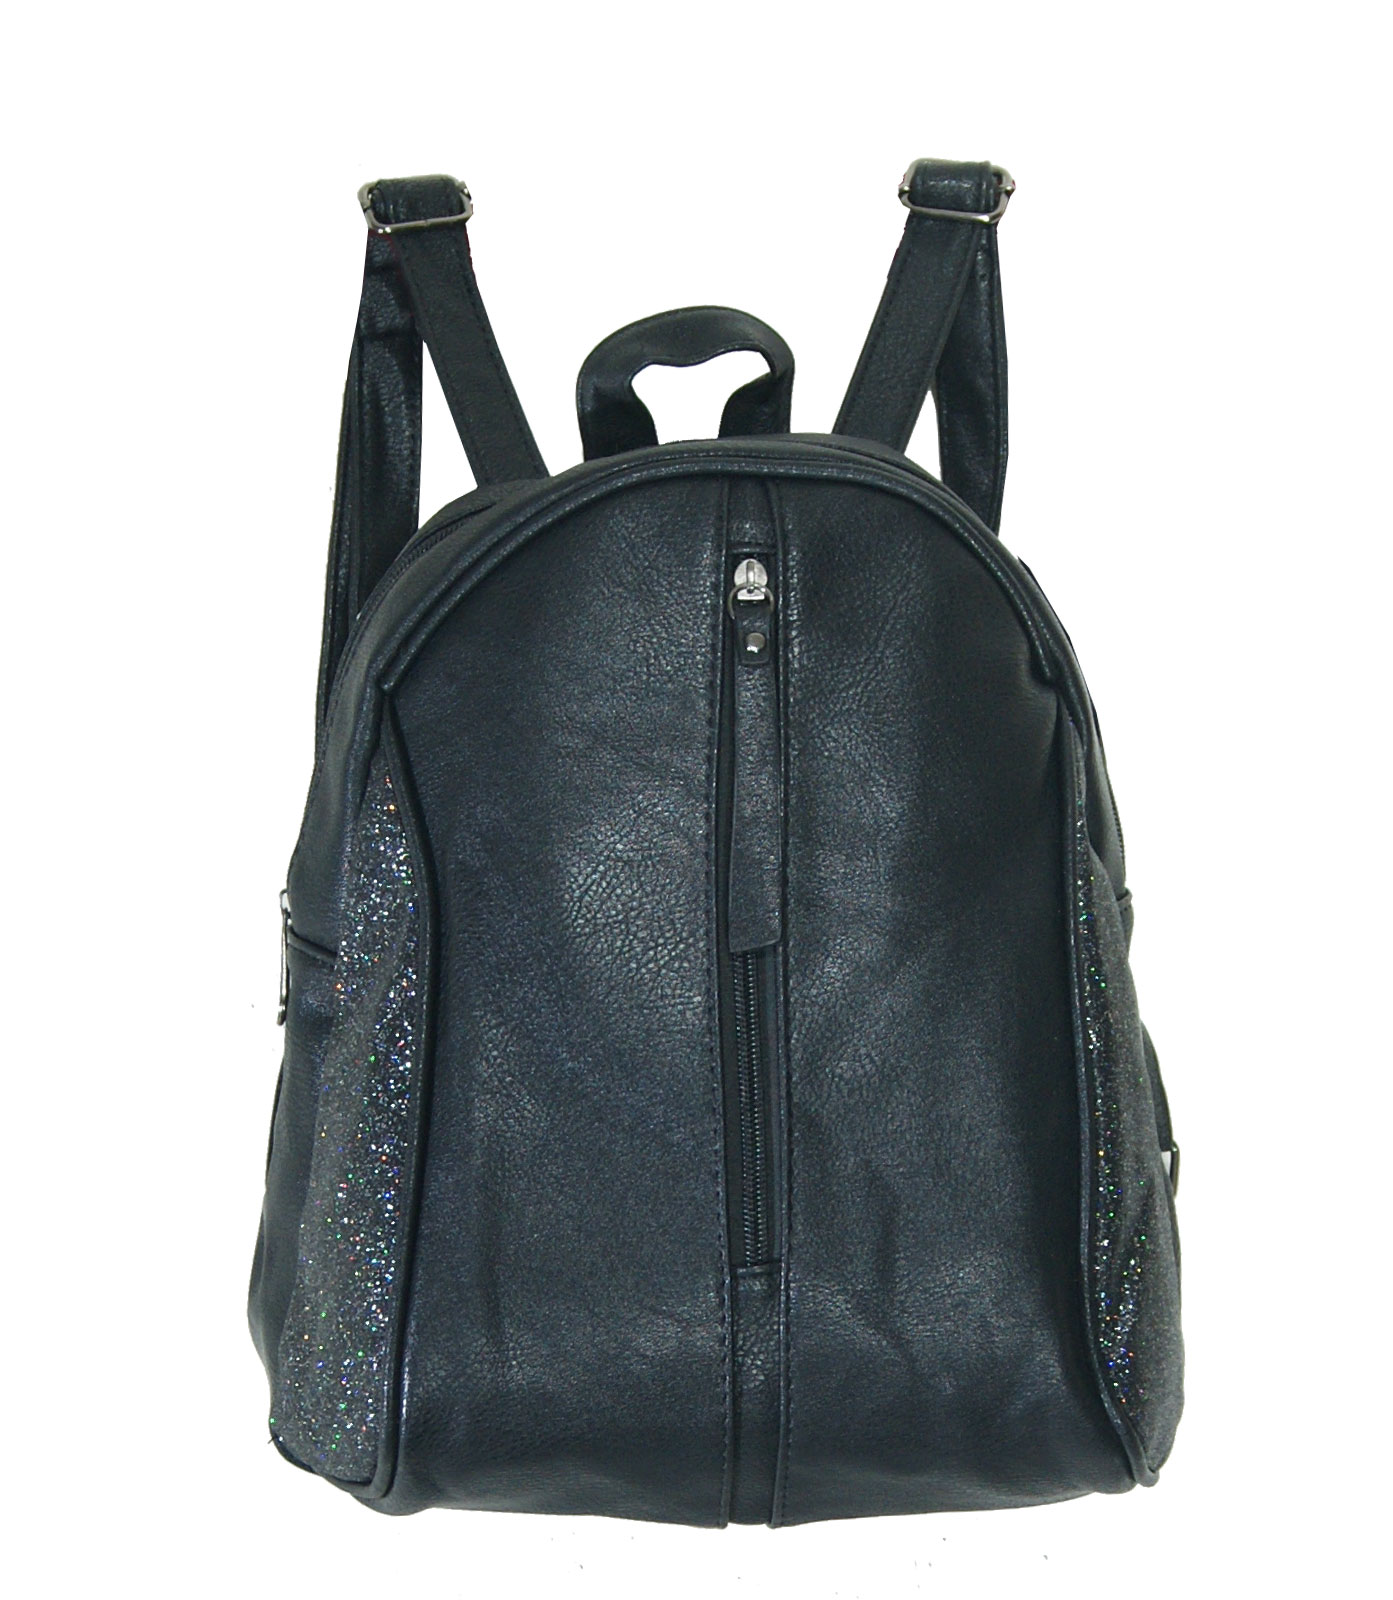 Backpack No 1 - Μαύρο (Silvio κωδ.: 404)